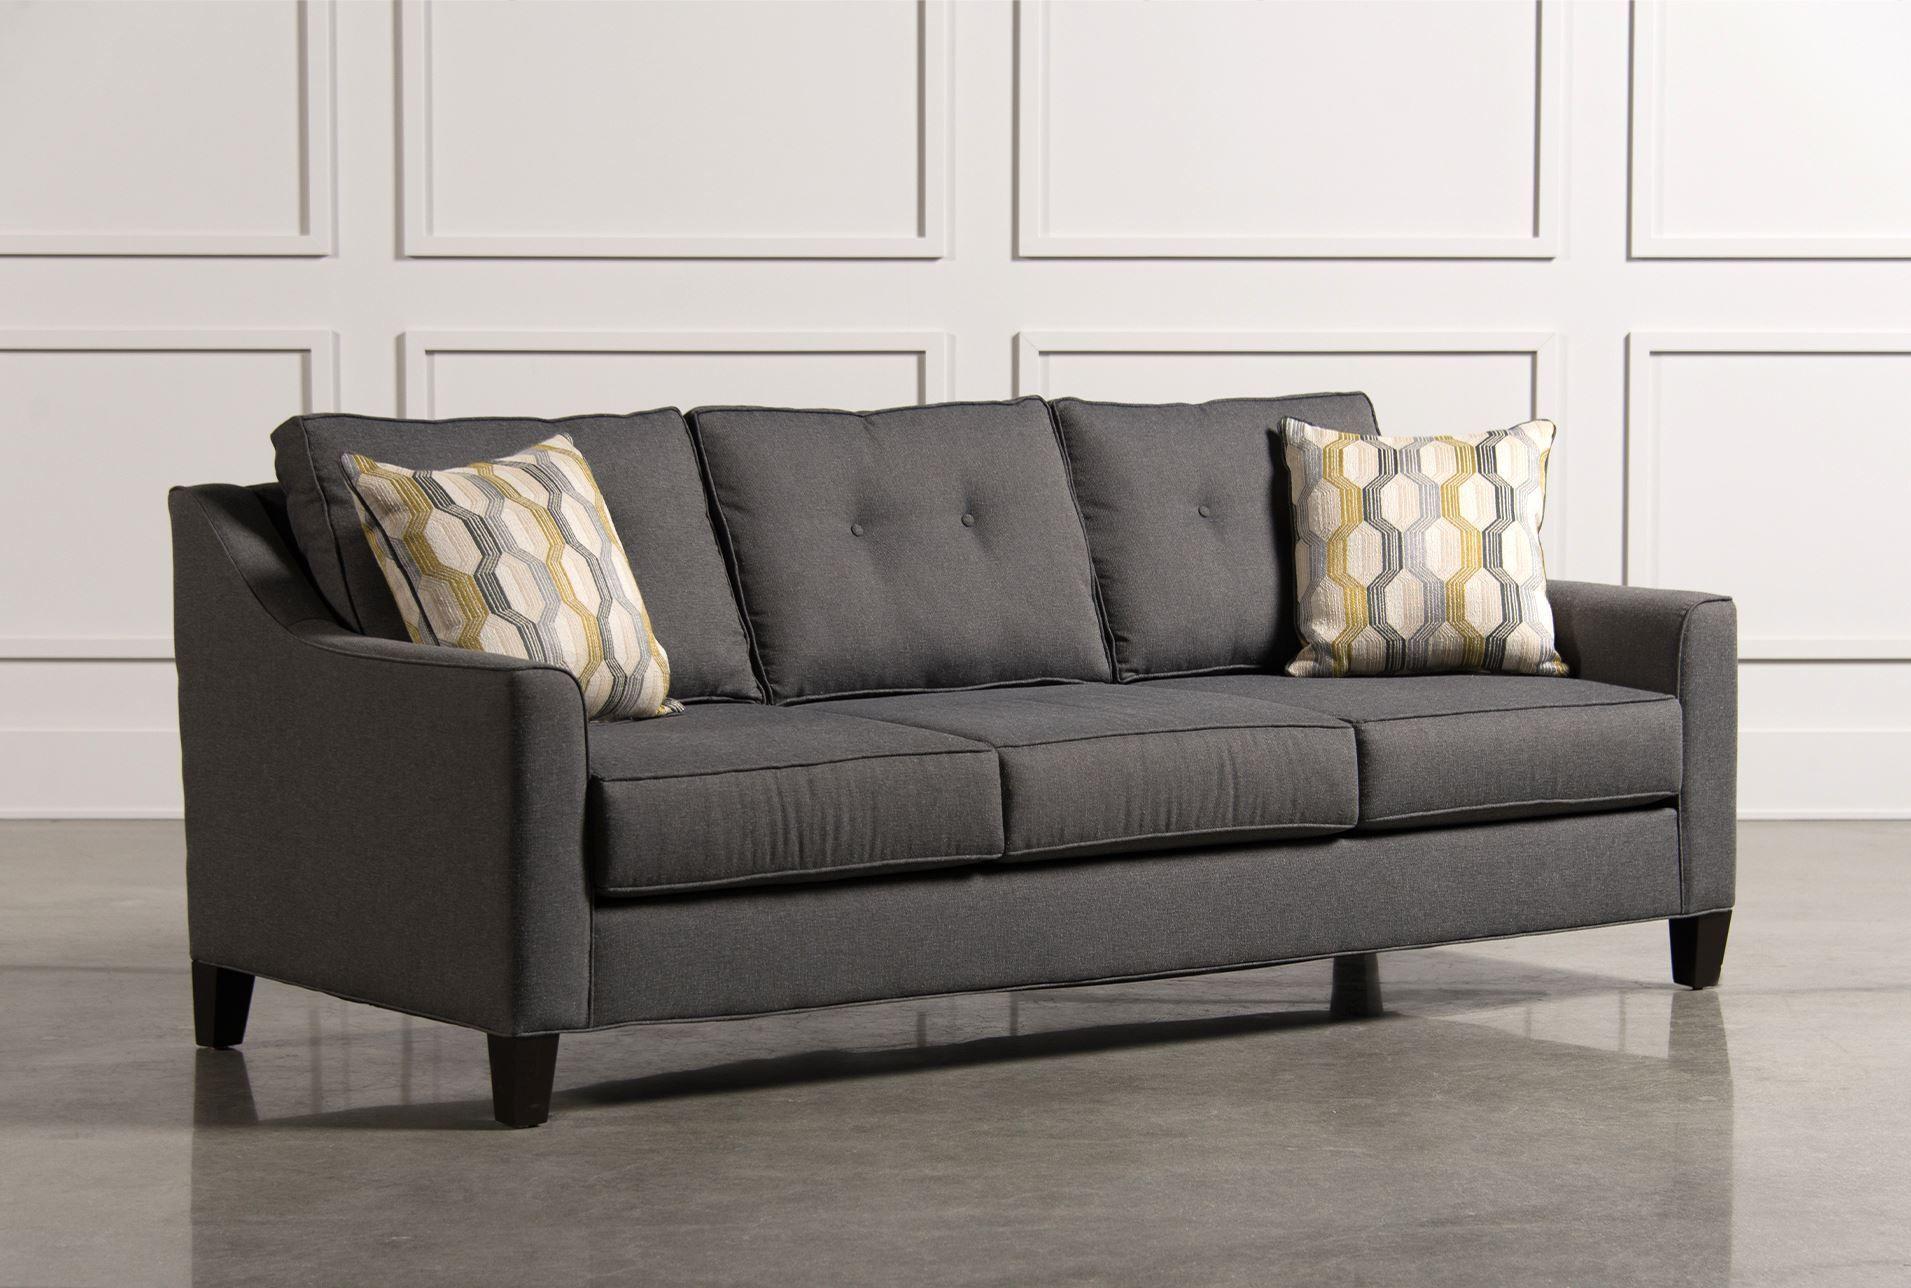 Corner Sofa Designs Pricing And Where To Buy Corner Sofa Design